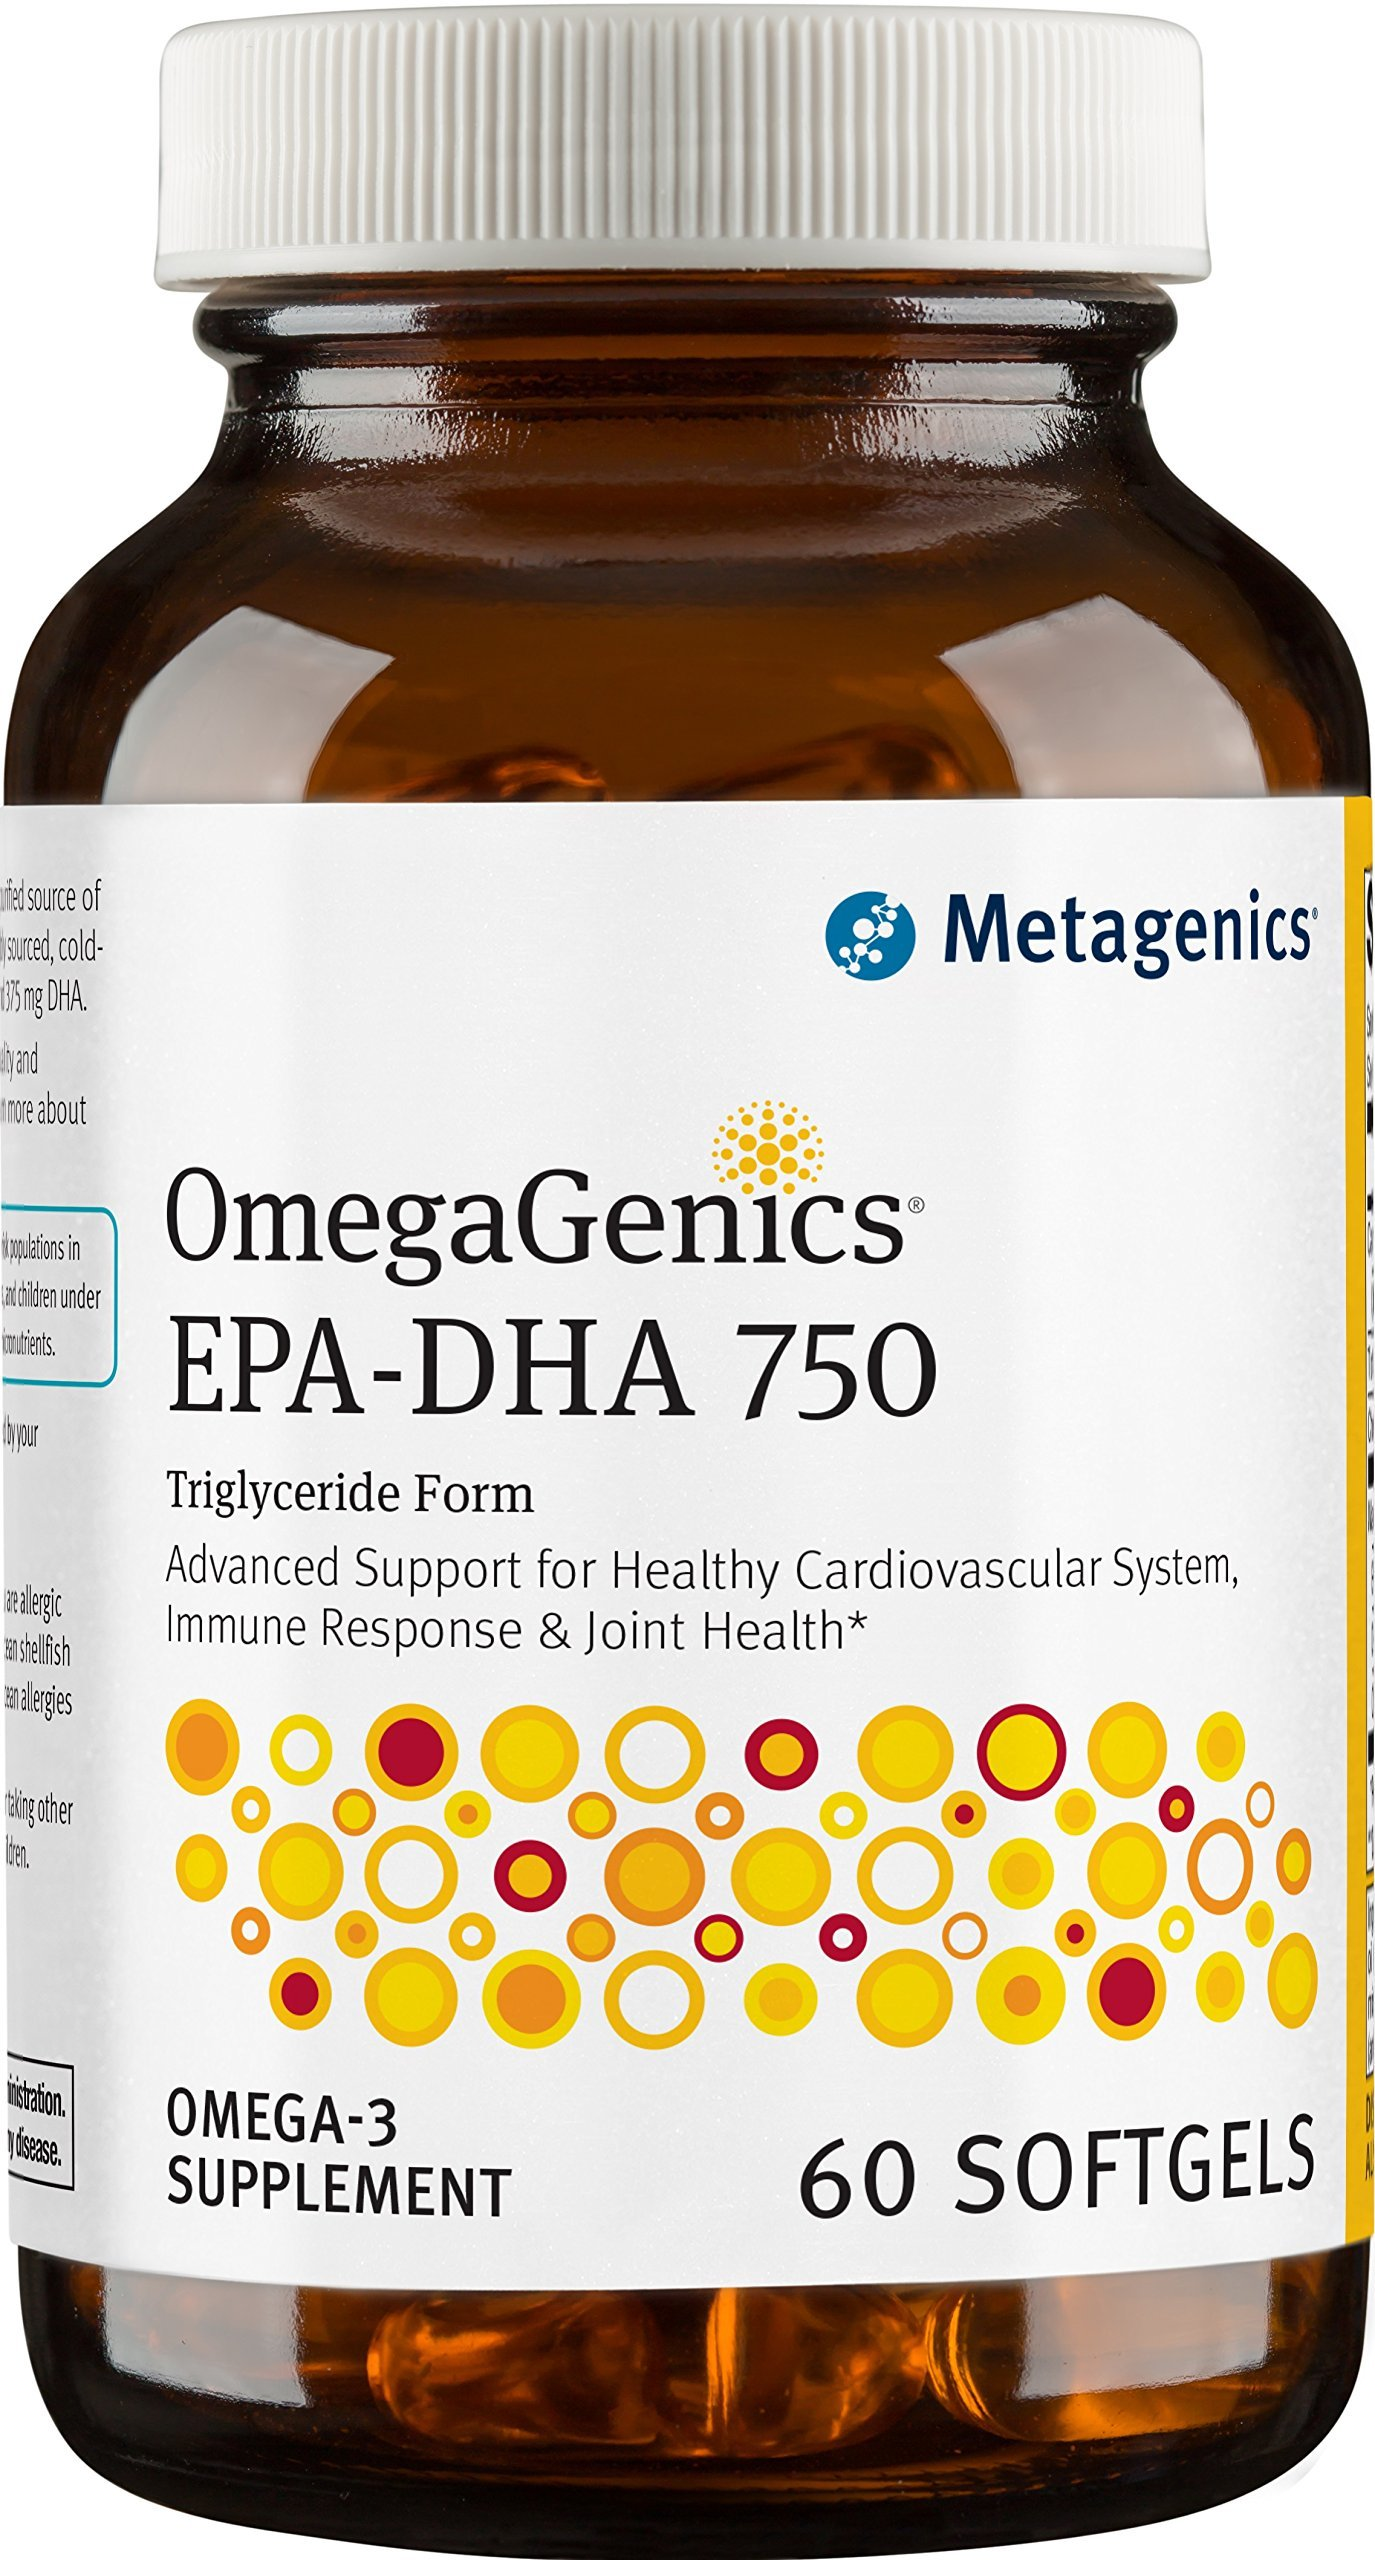 Metagenics OmegaGenics EPA-DHA 750, 60 Count